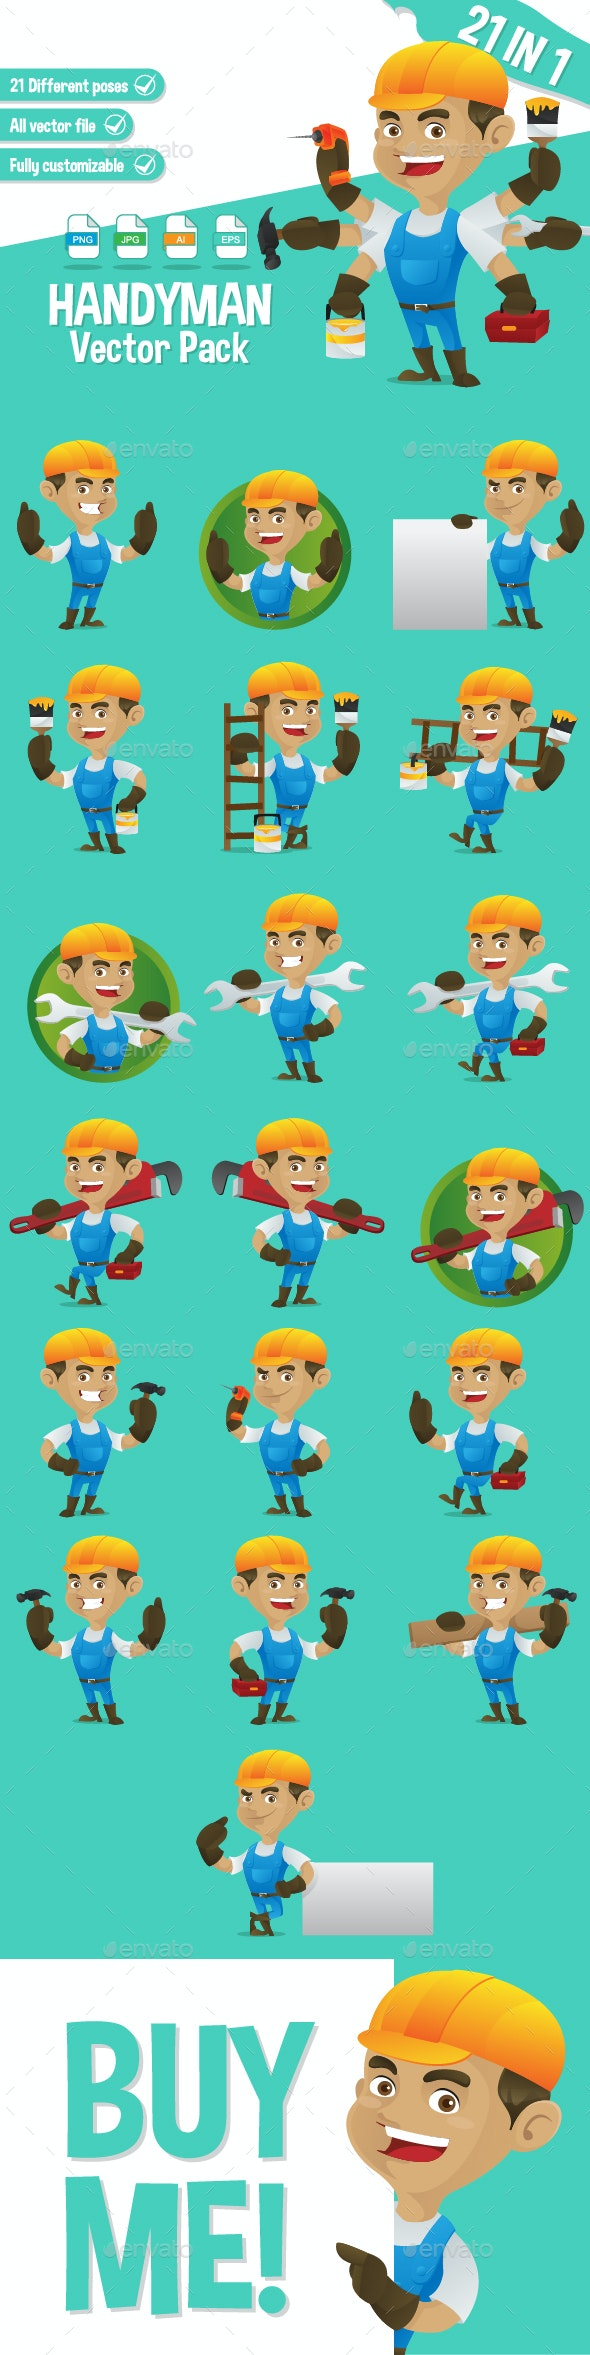 Handyman Vector Pack - People Characters